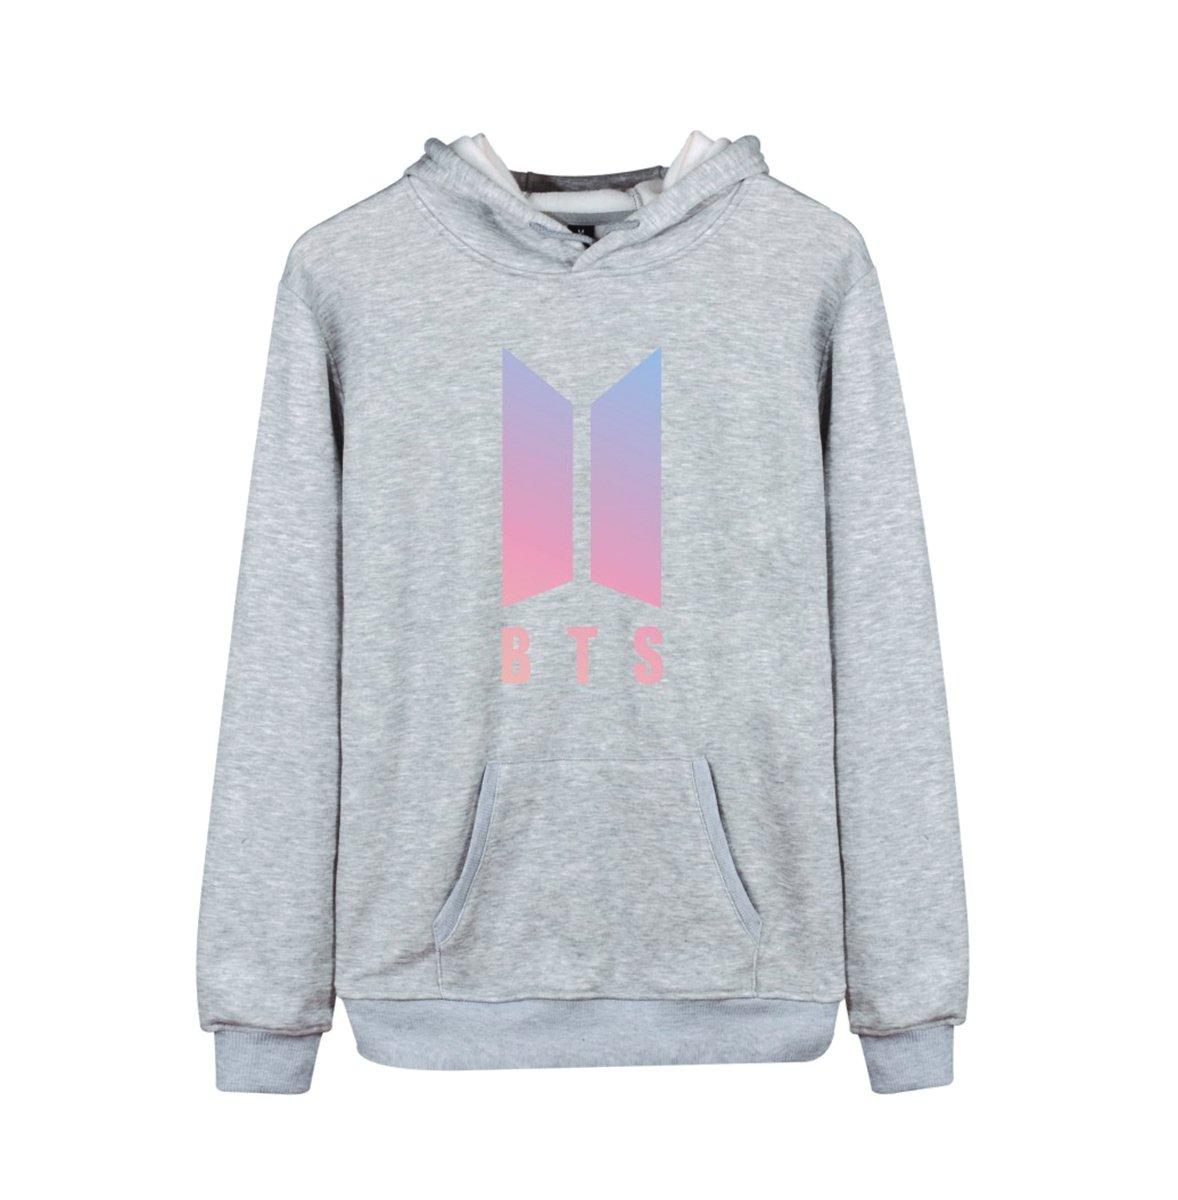 Kpop BTS Love Yourself Her Hoodie Suga Rap-Monster Jimin Jin J-Hope Jung Kook Unisex Fashion Jumper for Women Men Sweatshirt by Newhe (Image #3)